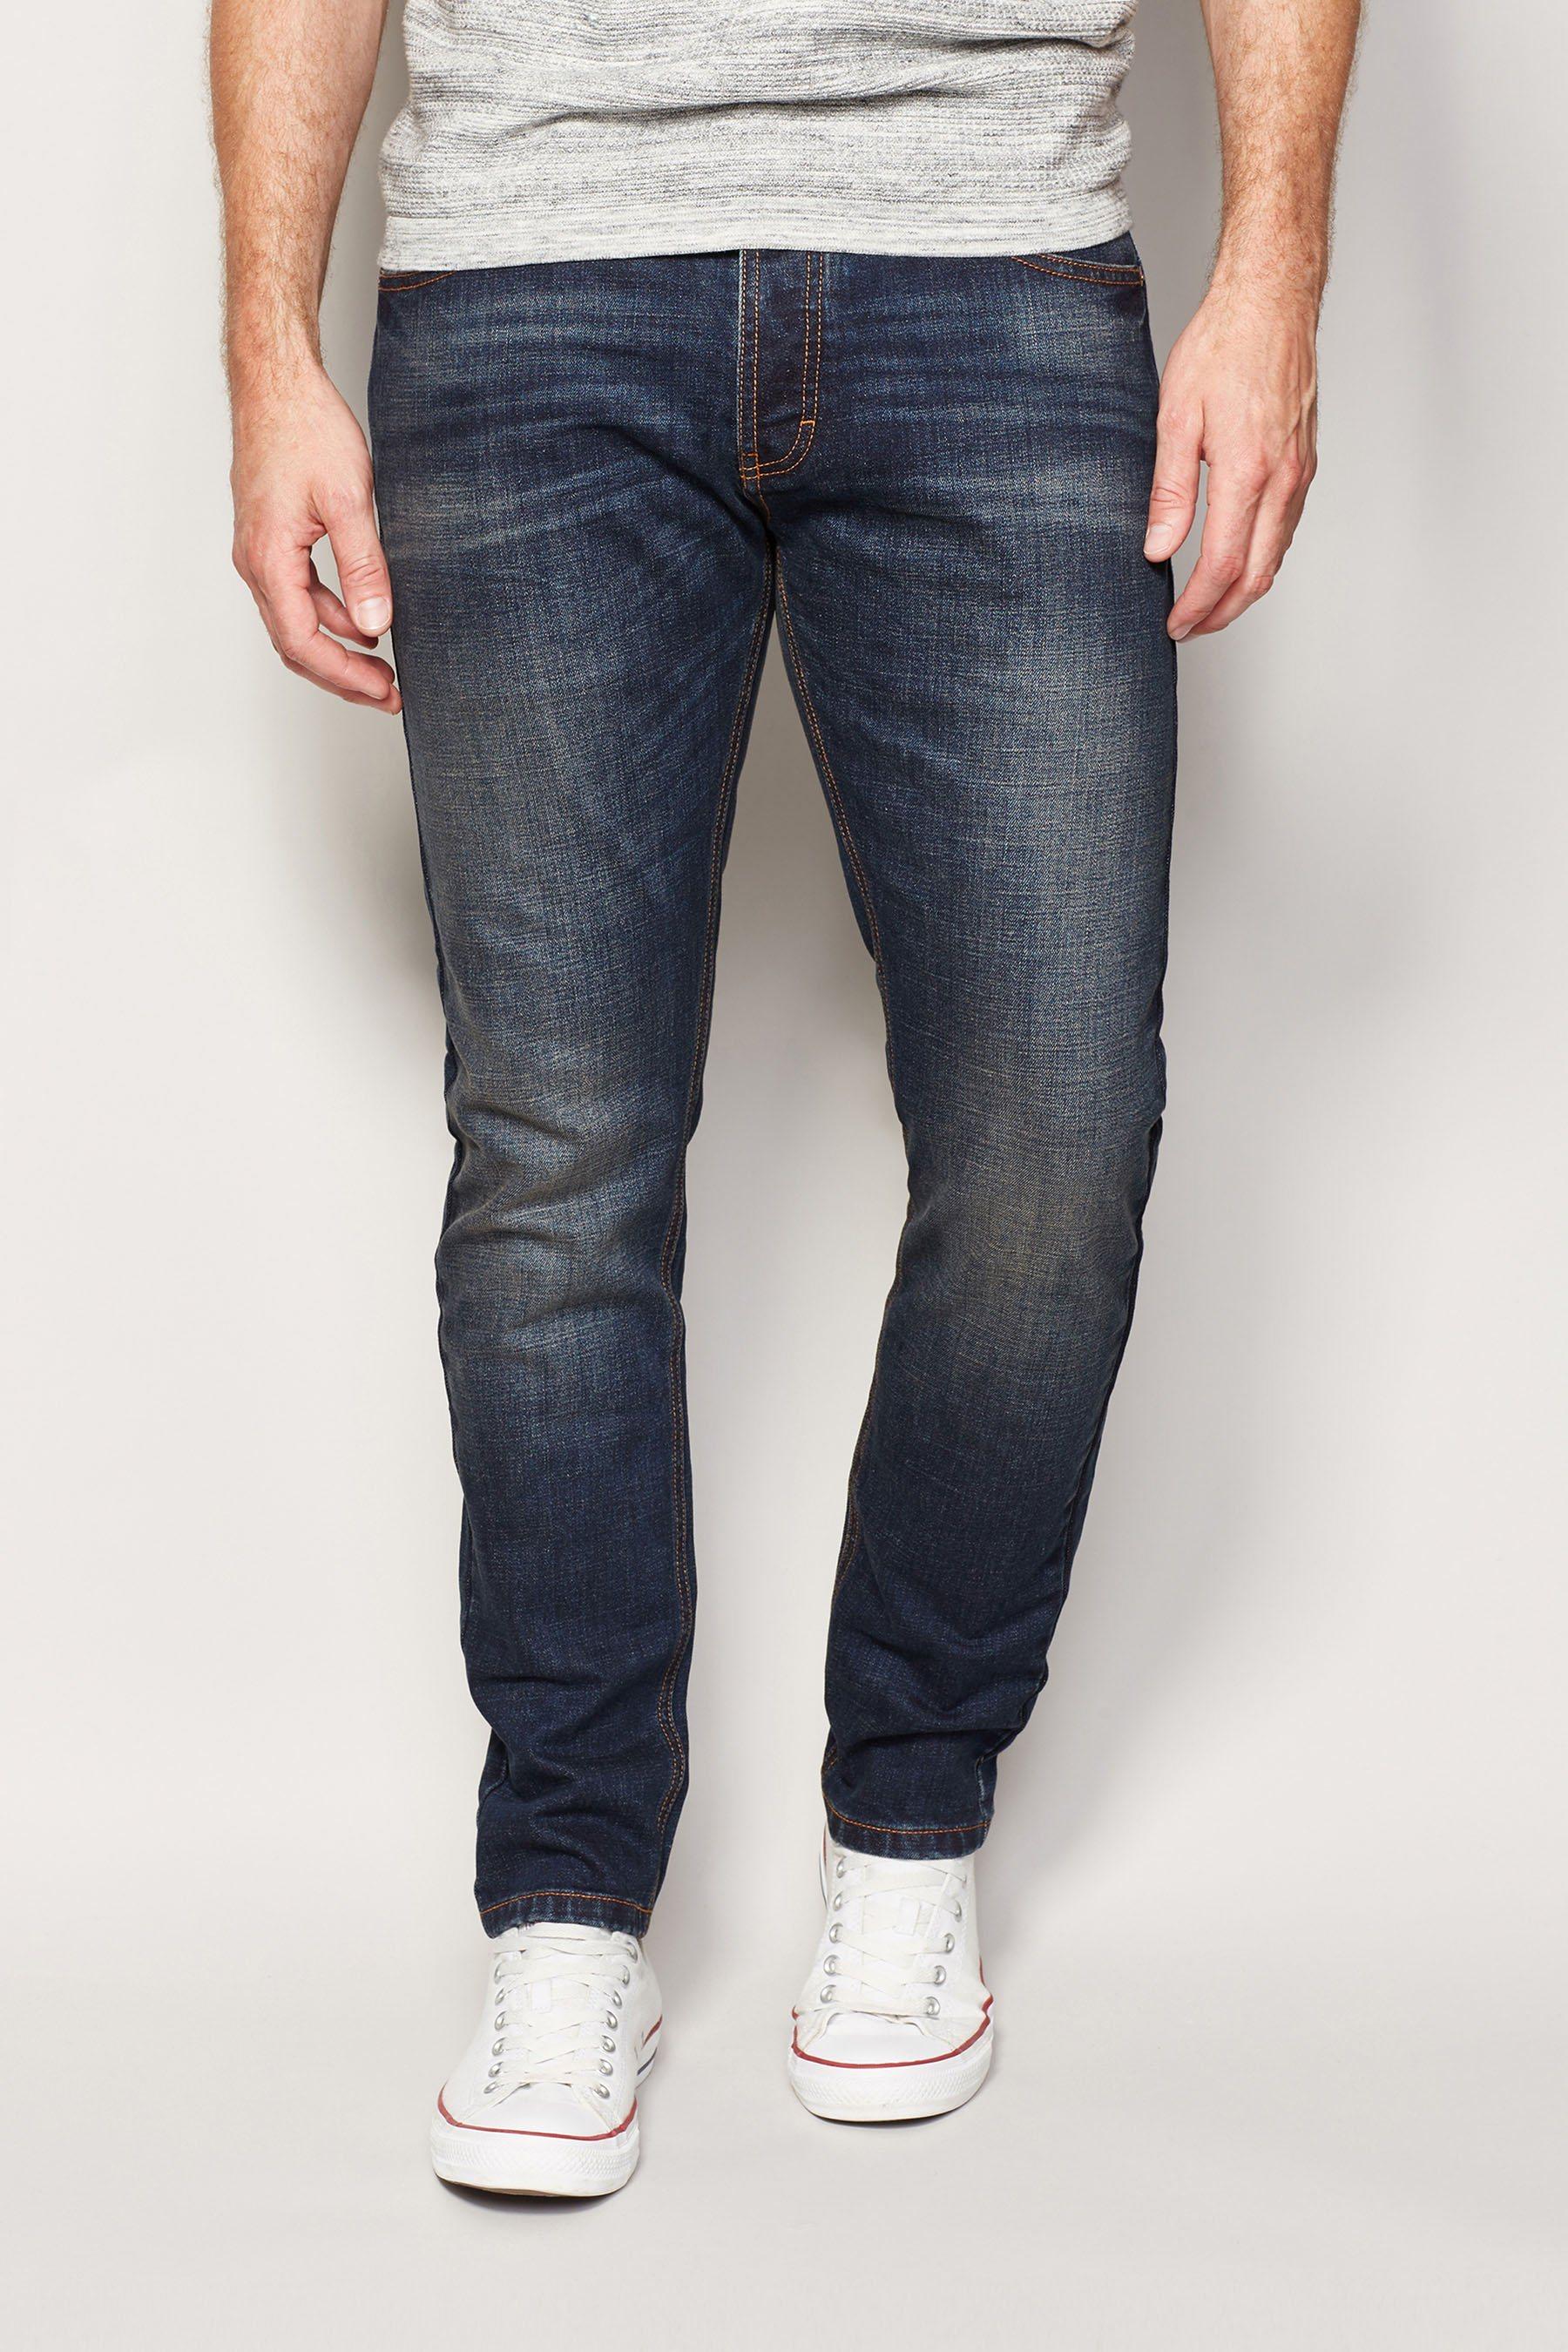 next skinny fit dirty denim stretch jeans stylefruits. Black Bedroom Furniture Sets. Home Design Ideas